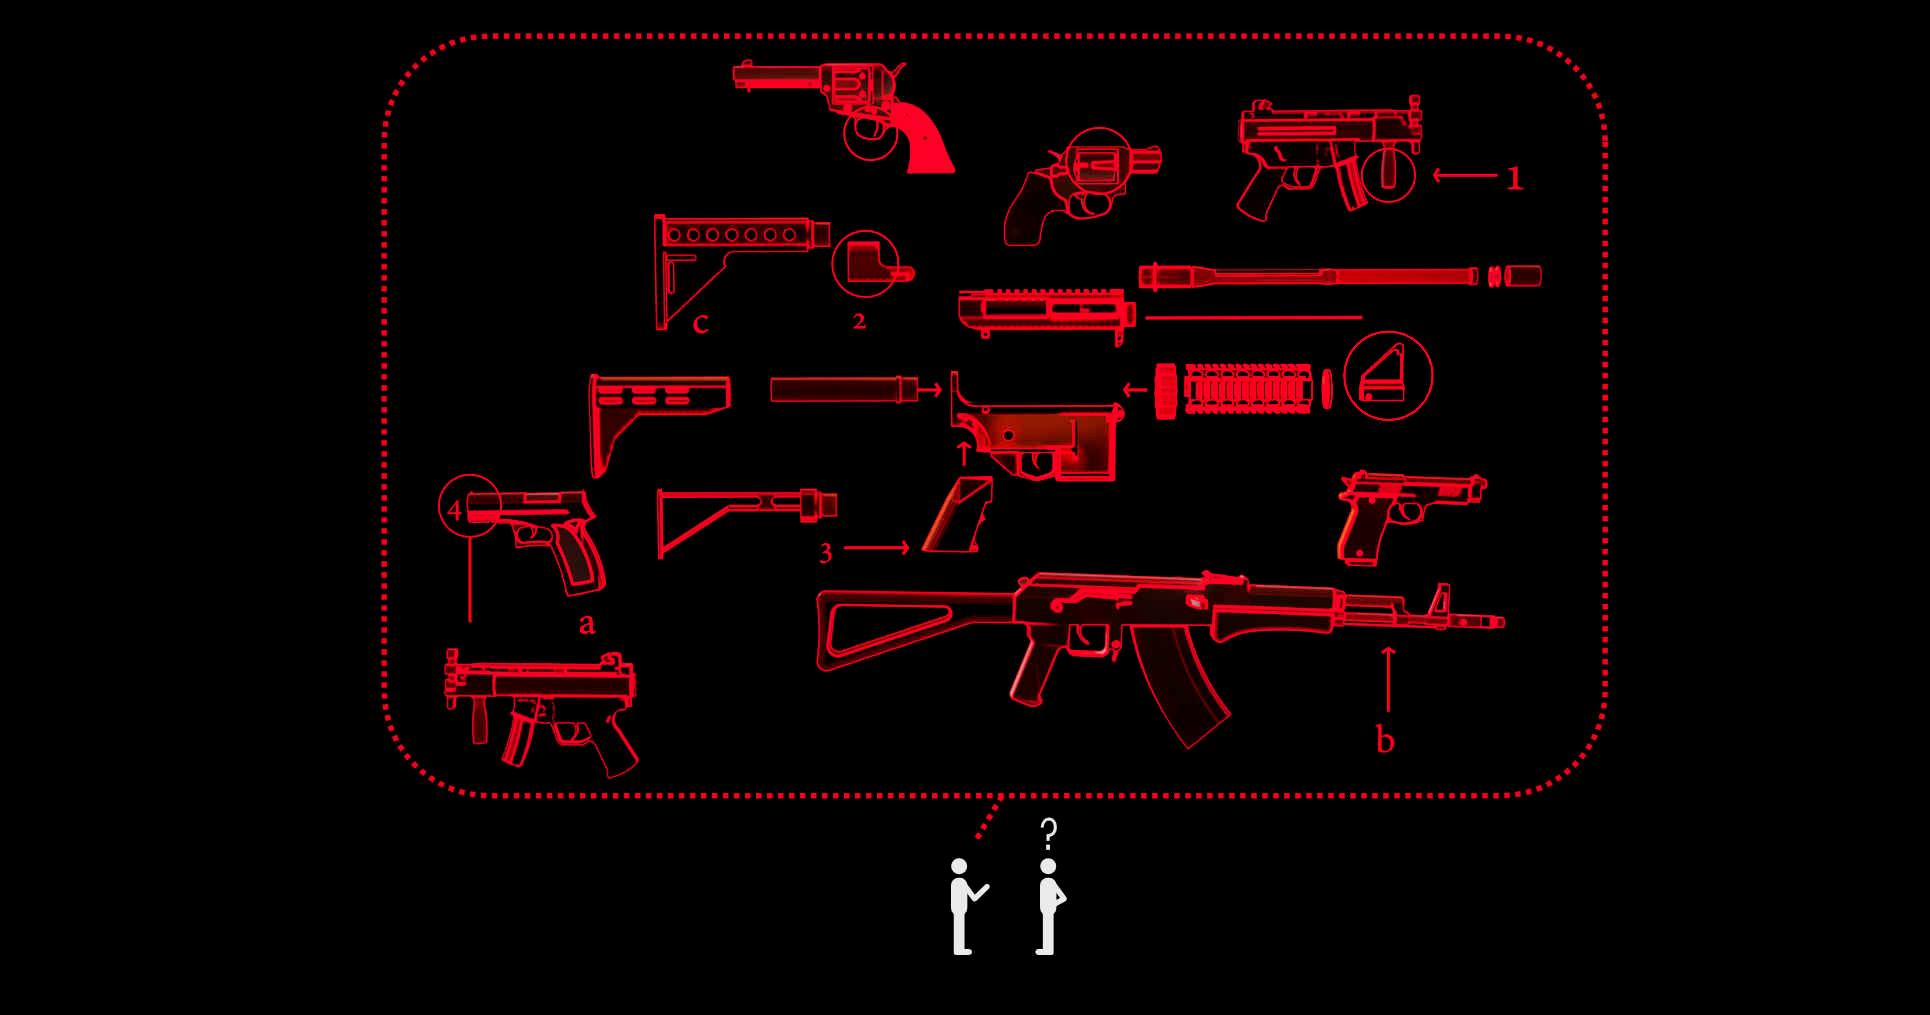 Caliber, cartridges, and bump stocks: guns, explained for non-gun people